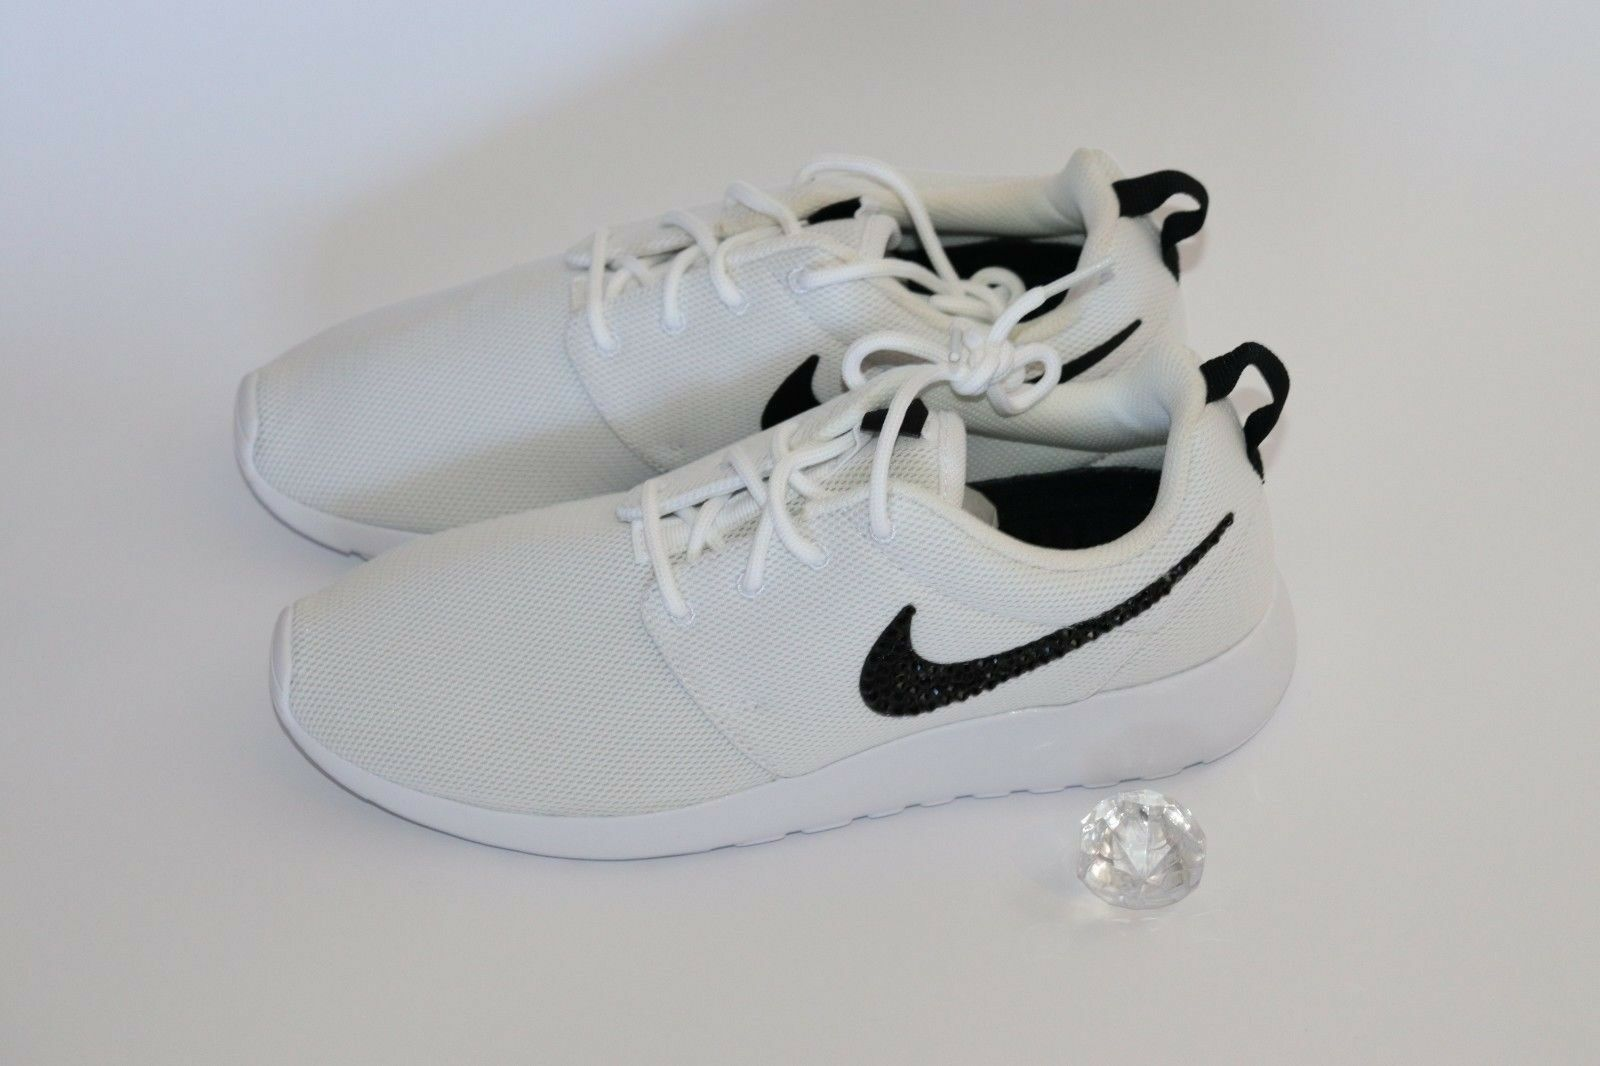 Custom blanc Nike Roshe One, Authentic, Bling, Swarovski Crystals, FREE SHIPPING